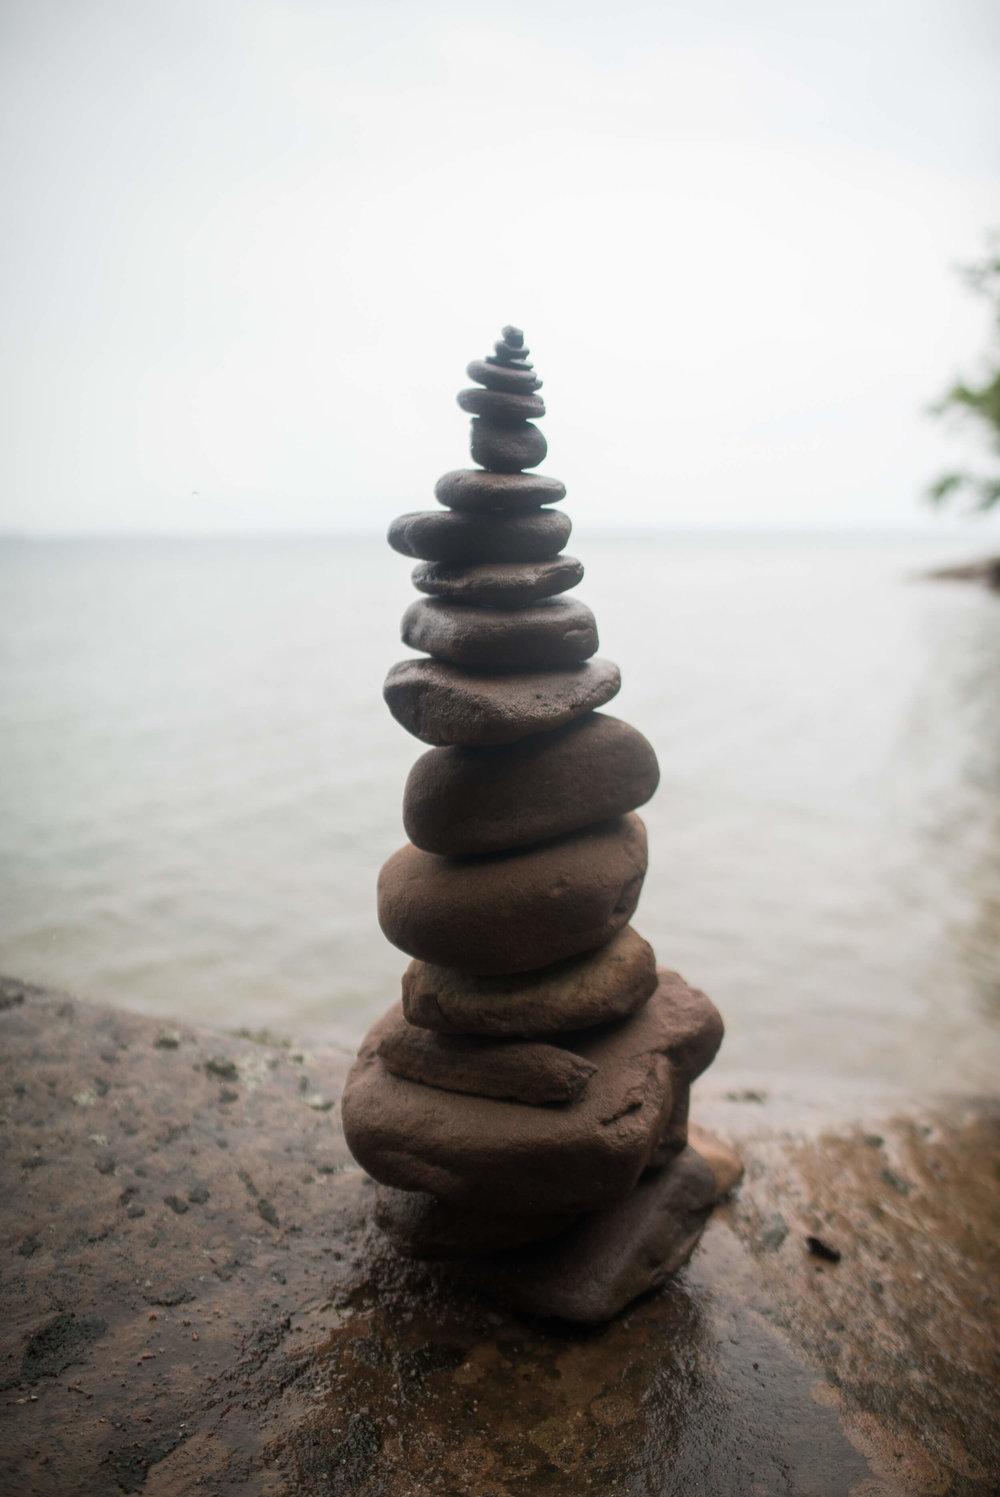 engle-olson-photography-madeline-island-20.jpg